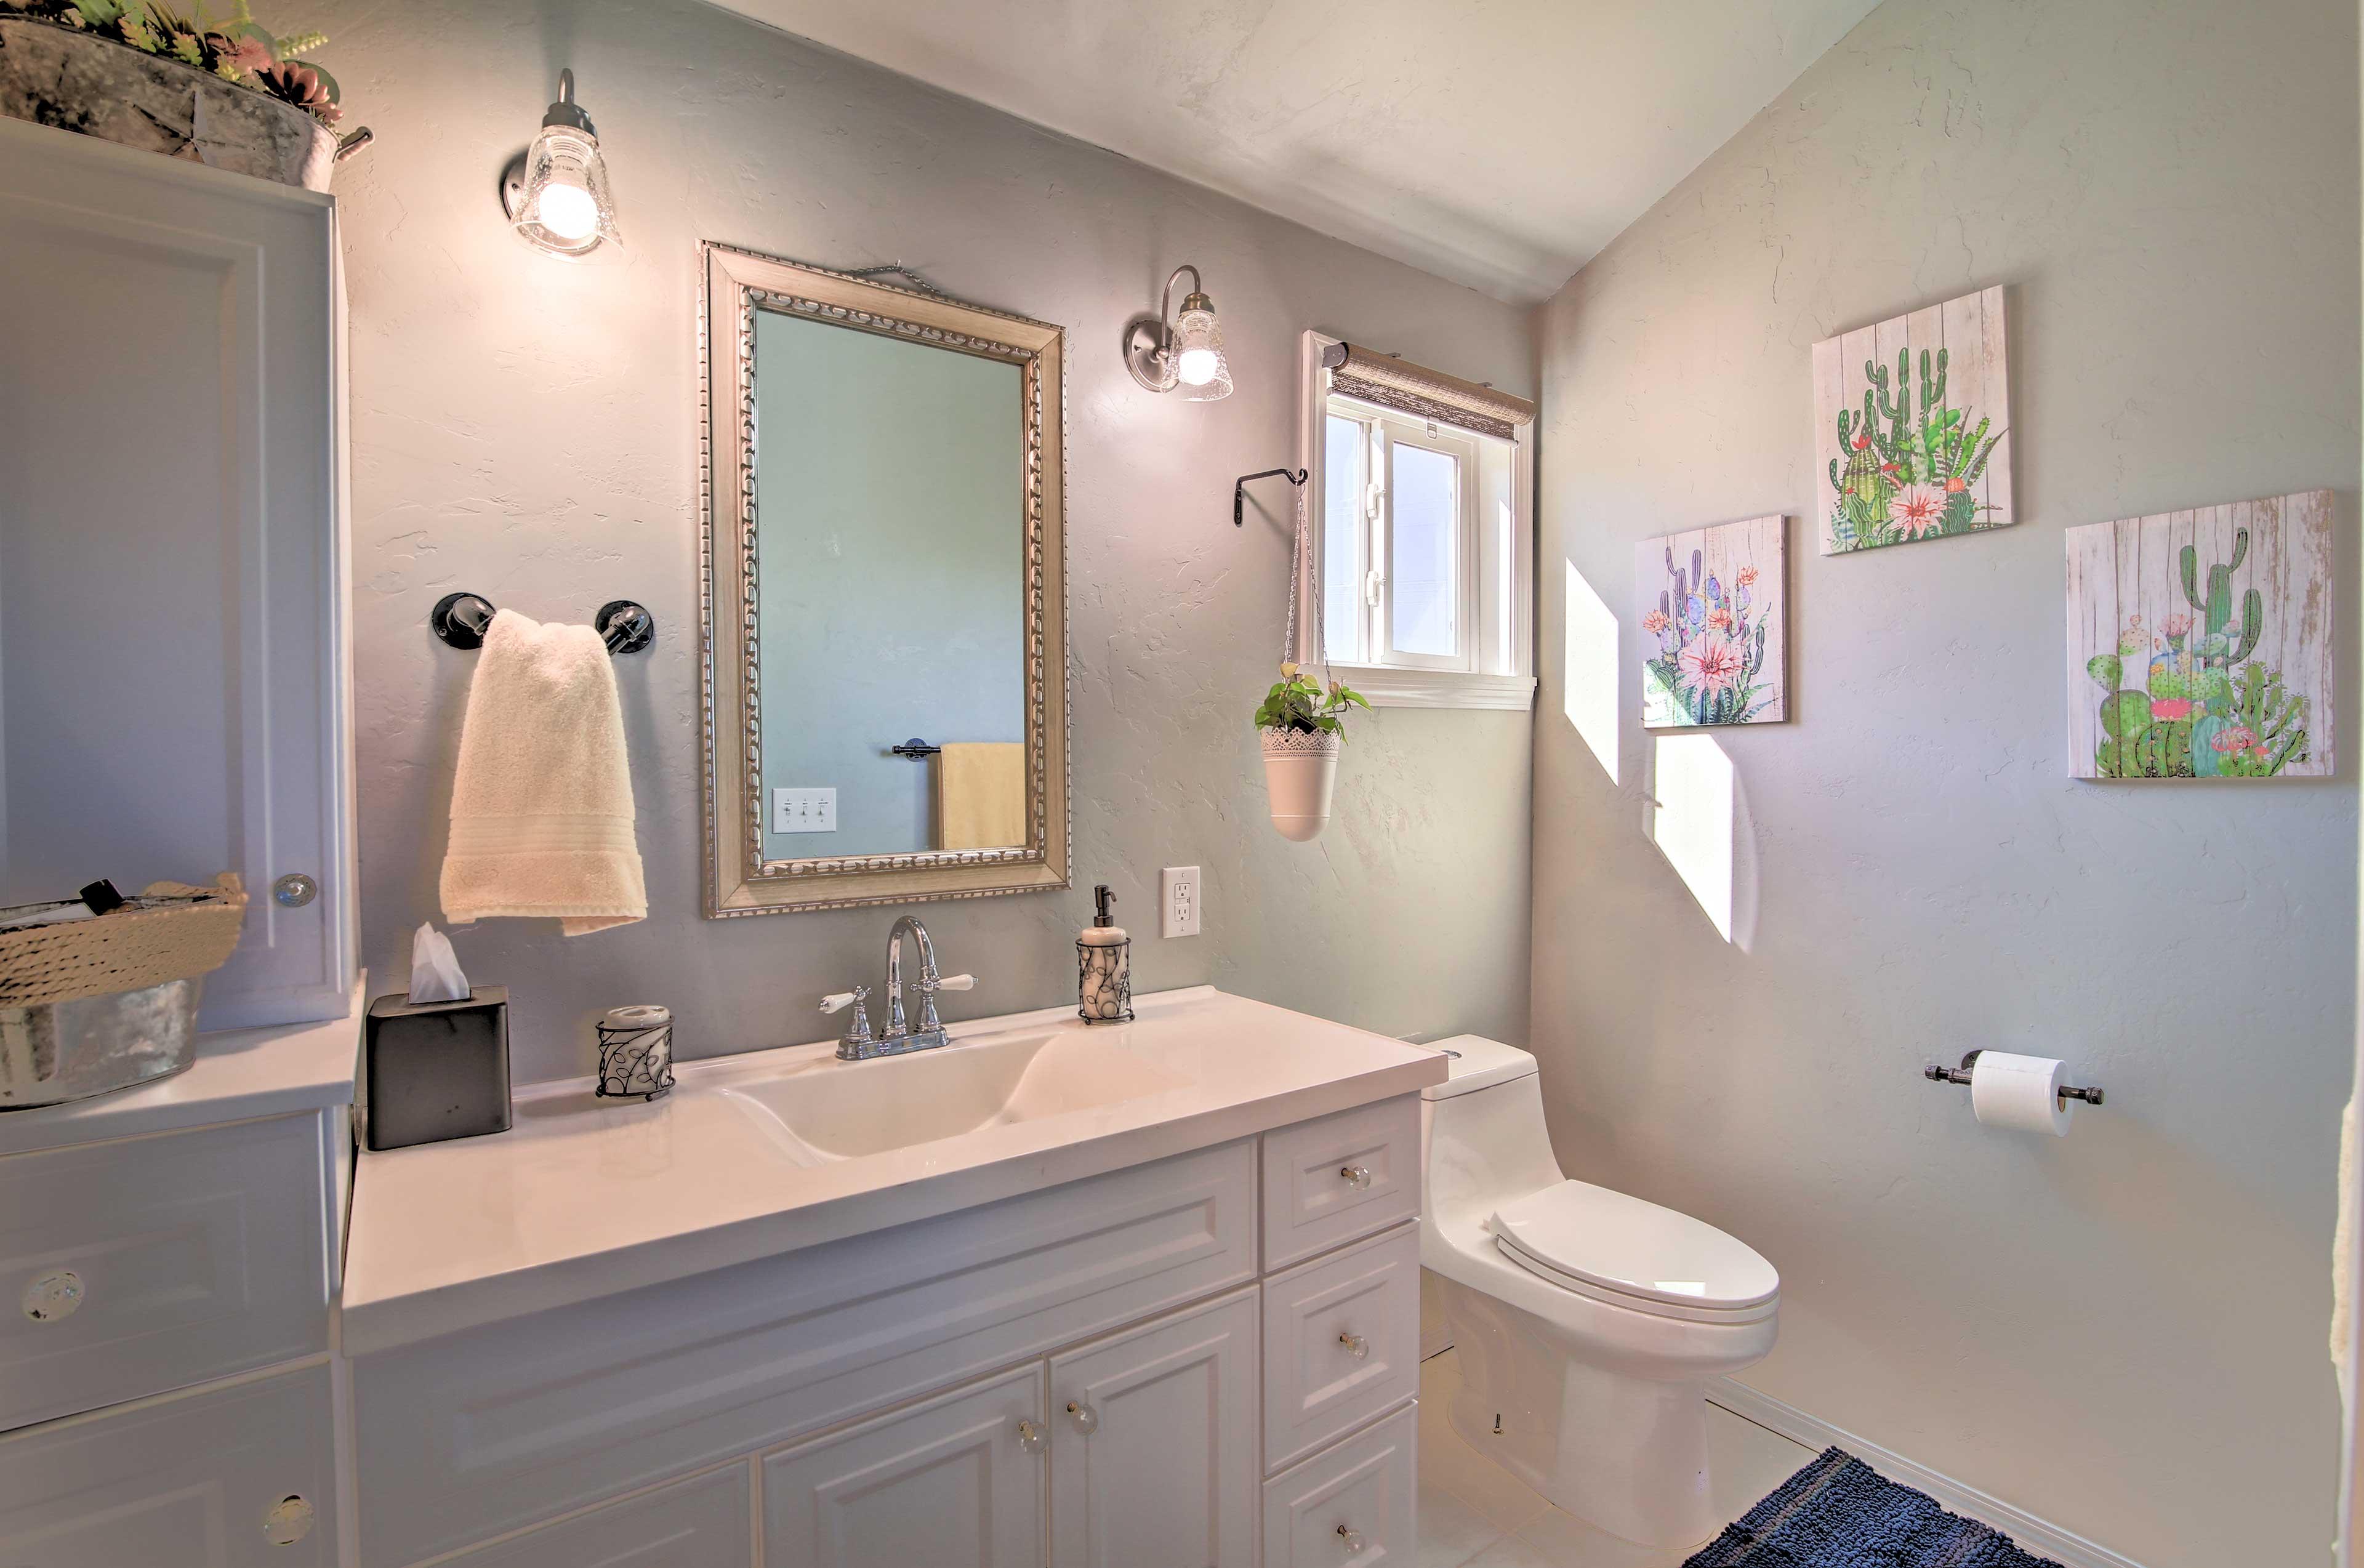 The en-suite bathroom has plenty of storage space for your toiletries.